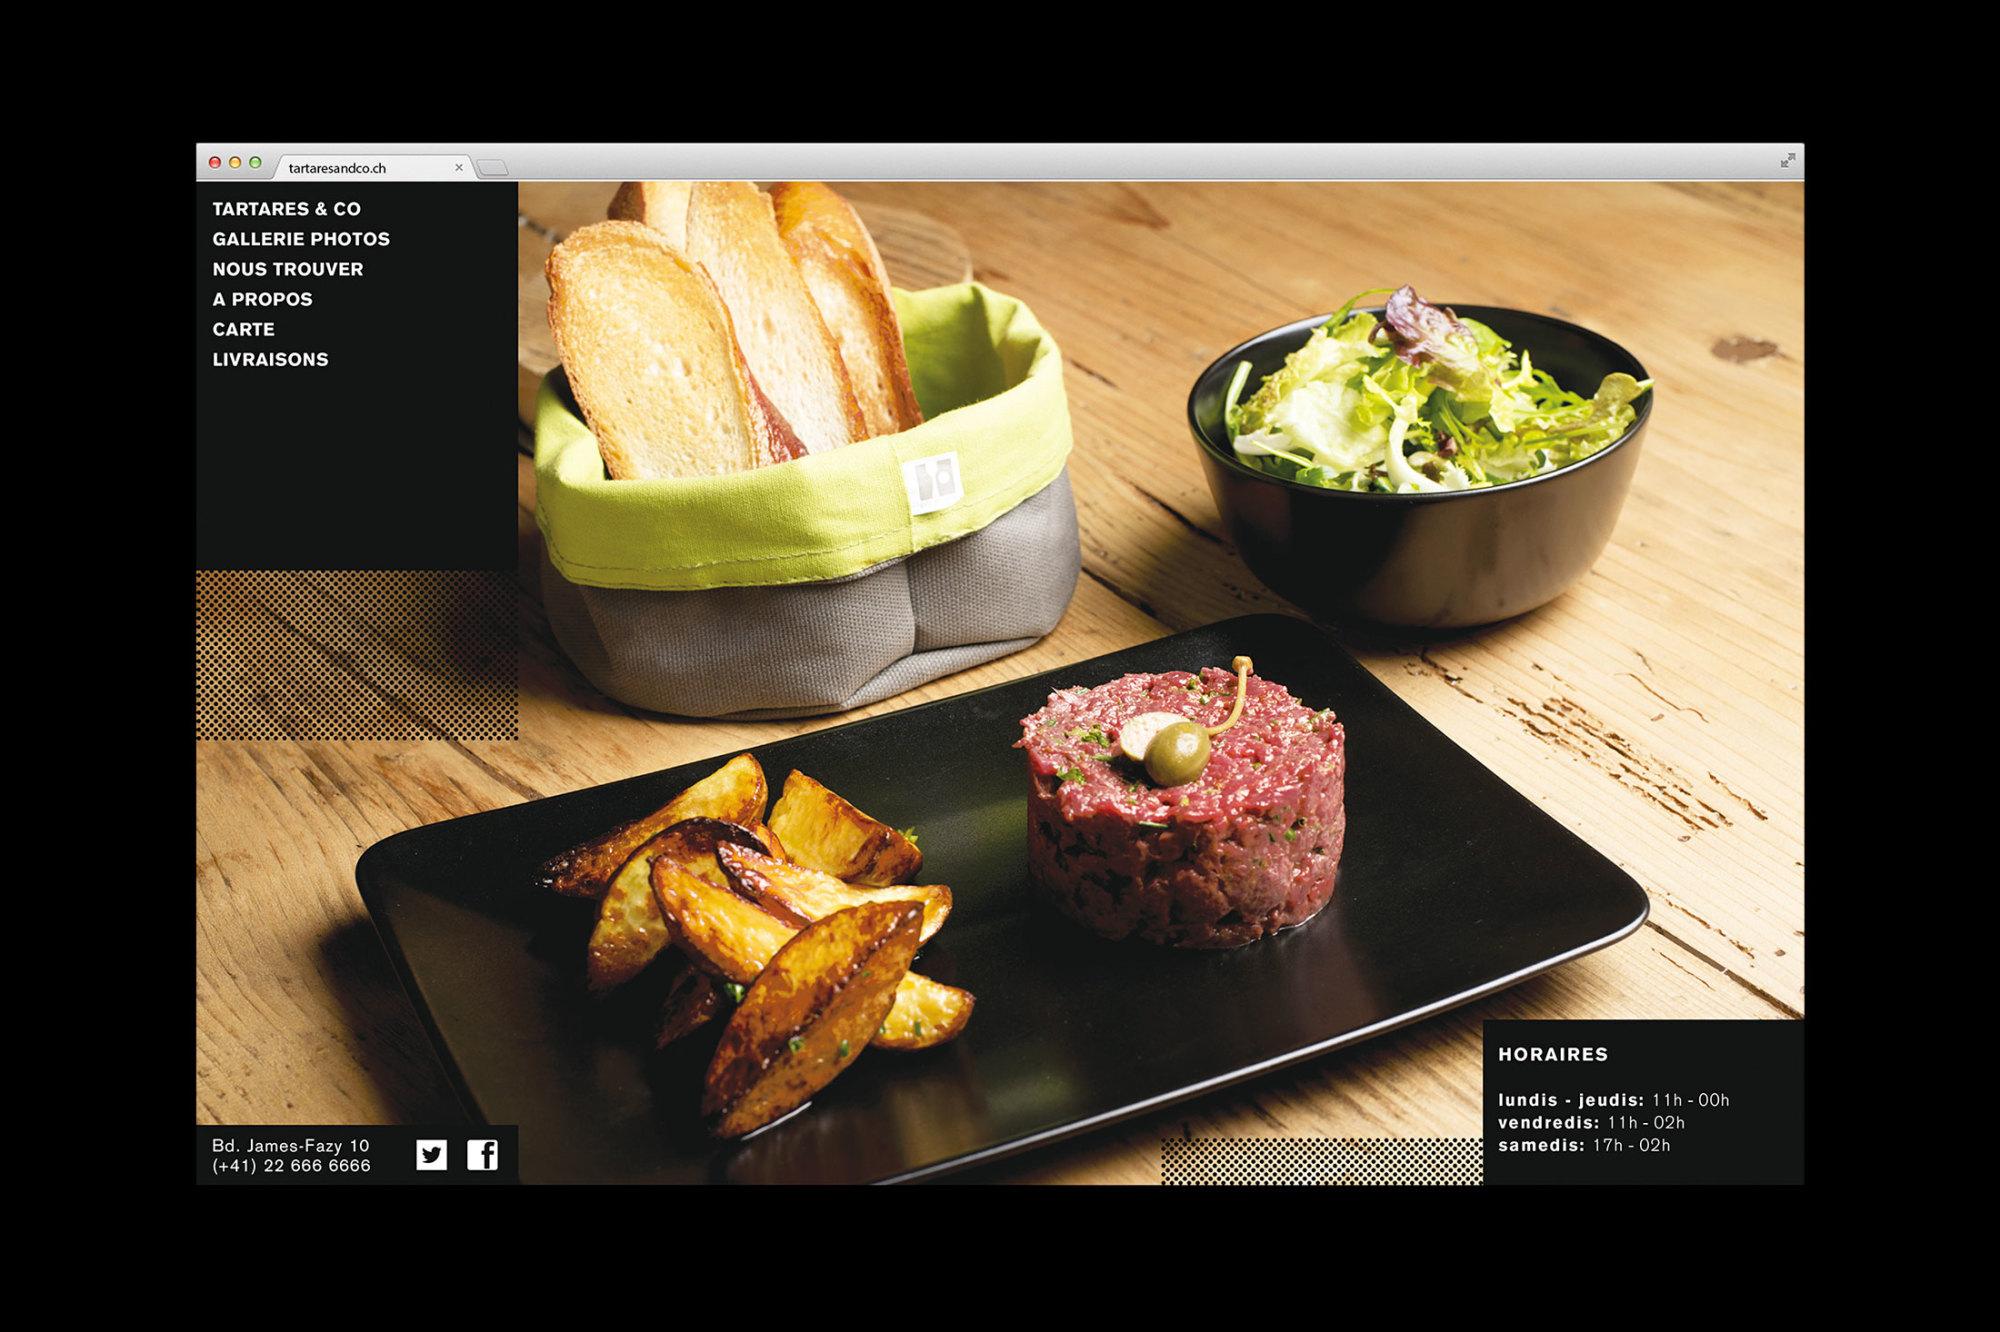 Graphisme Geneve graphic design graphique direction artistique logo identité visuelle identity branding brand  tartares & co bar restaurant grand prix 2015  web